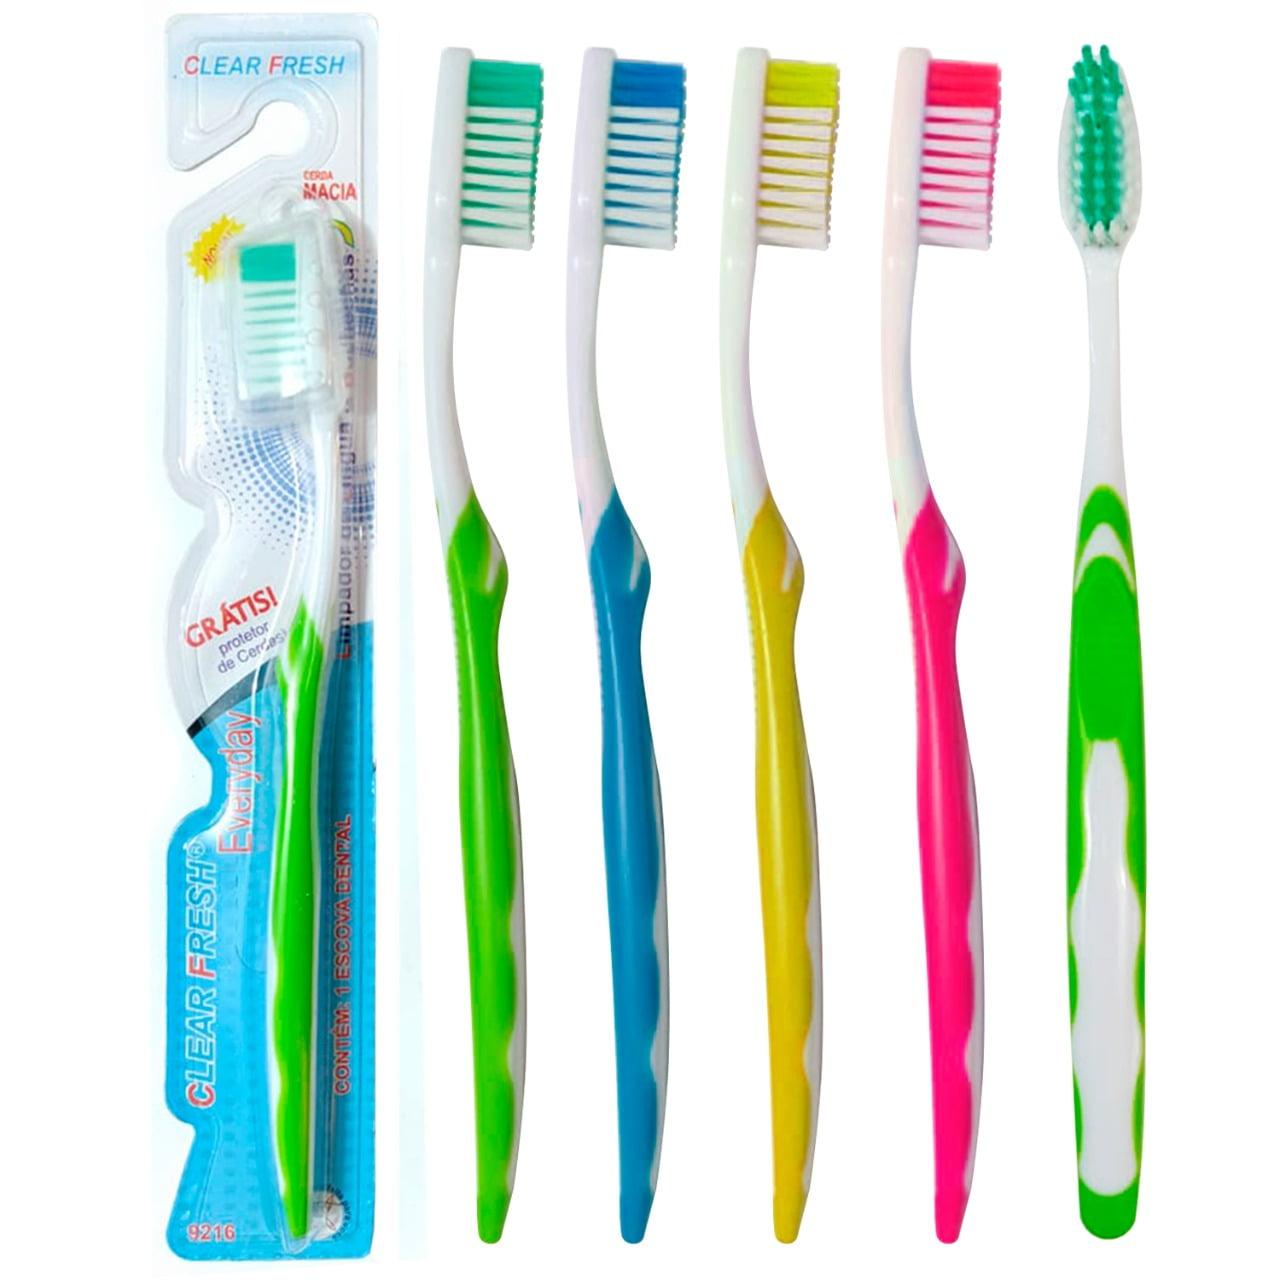 36 Escova De Dente Adulto Protetor Revenda Atacado 4 Cores